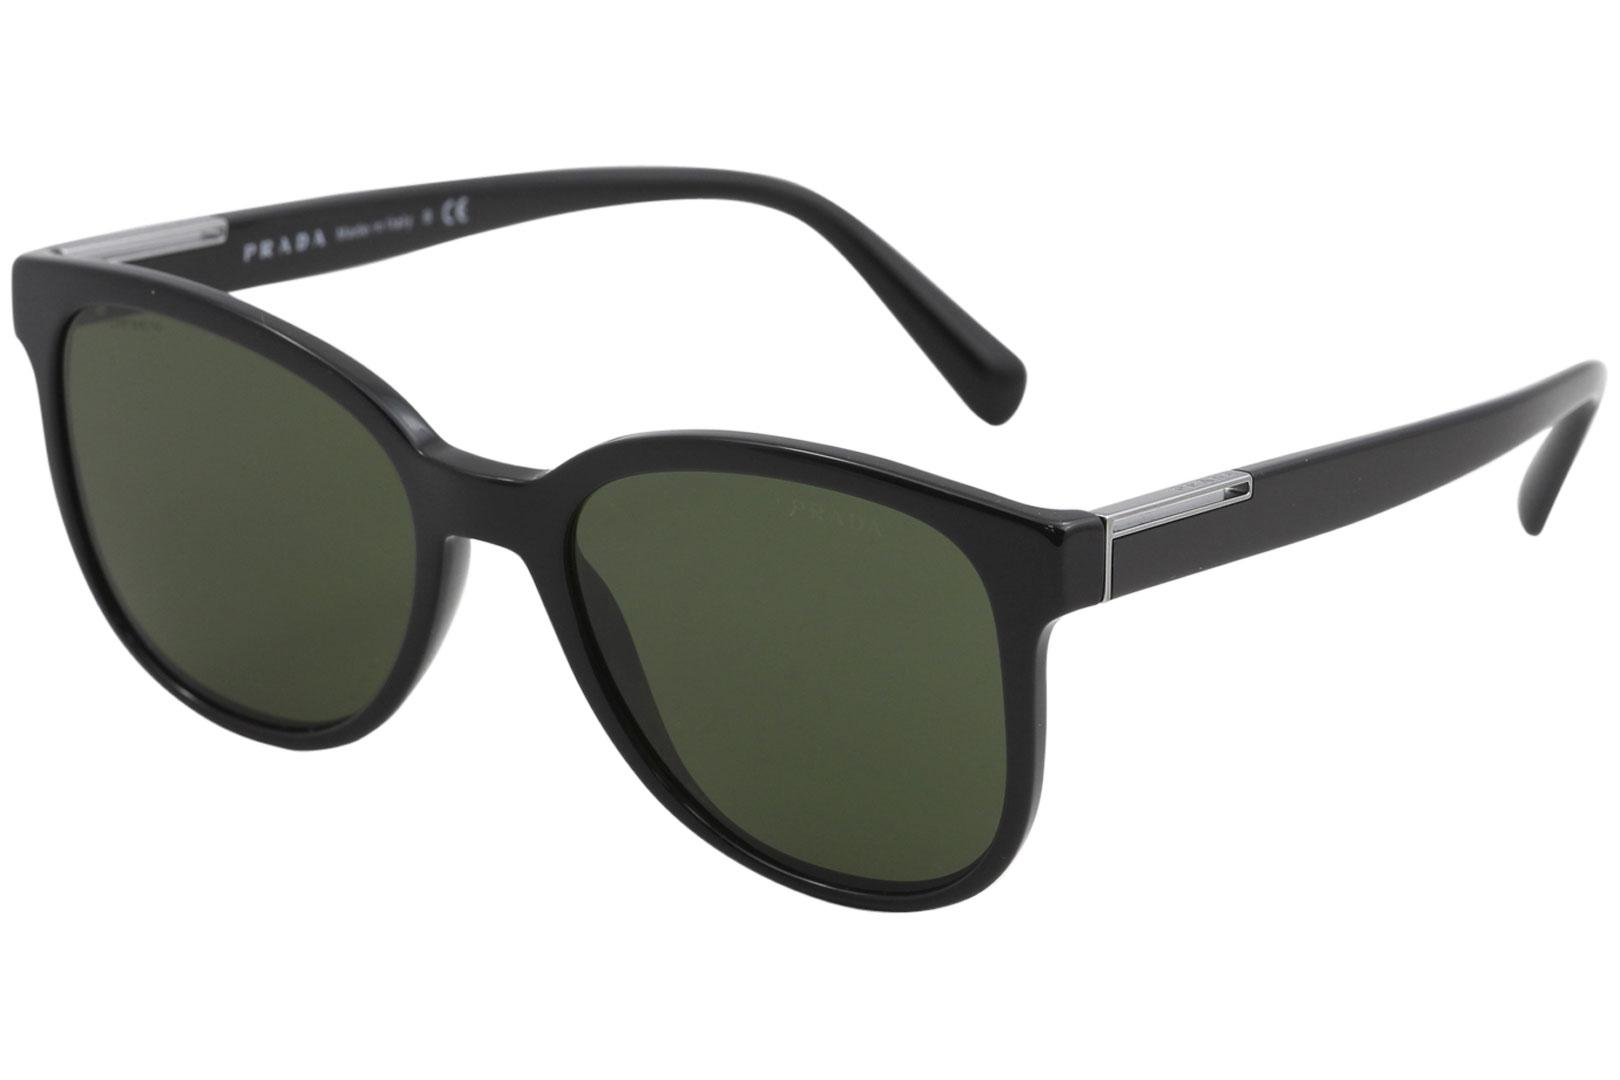 Prada Men's SPR08U SPR/08U Fashion Square Sunglasses